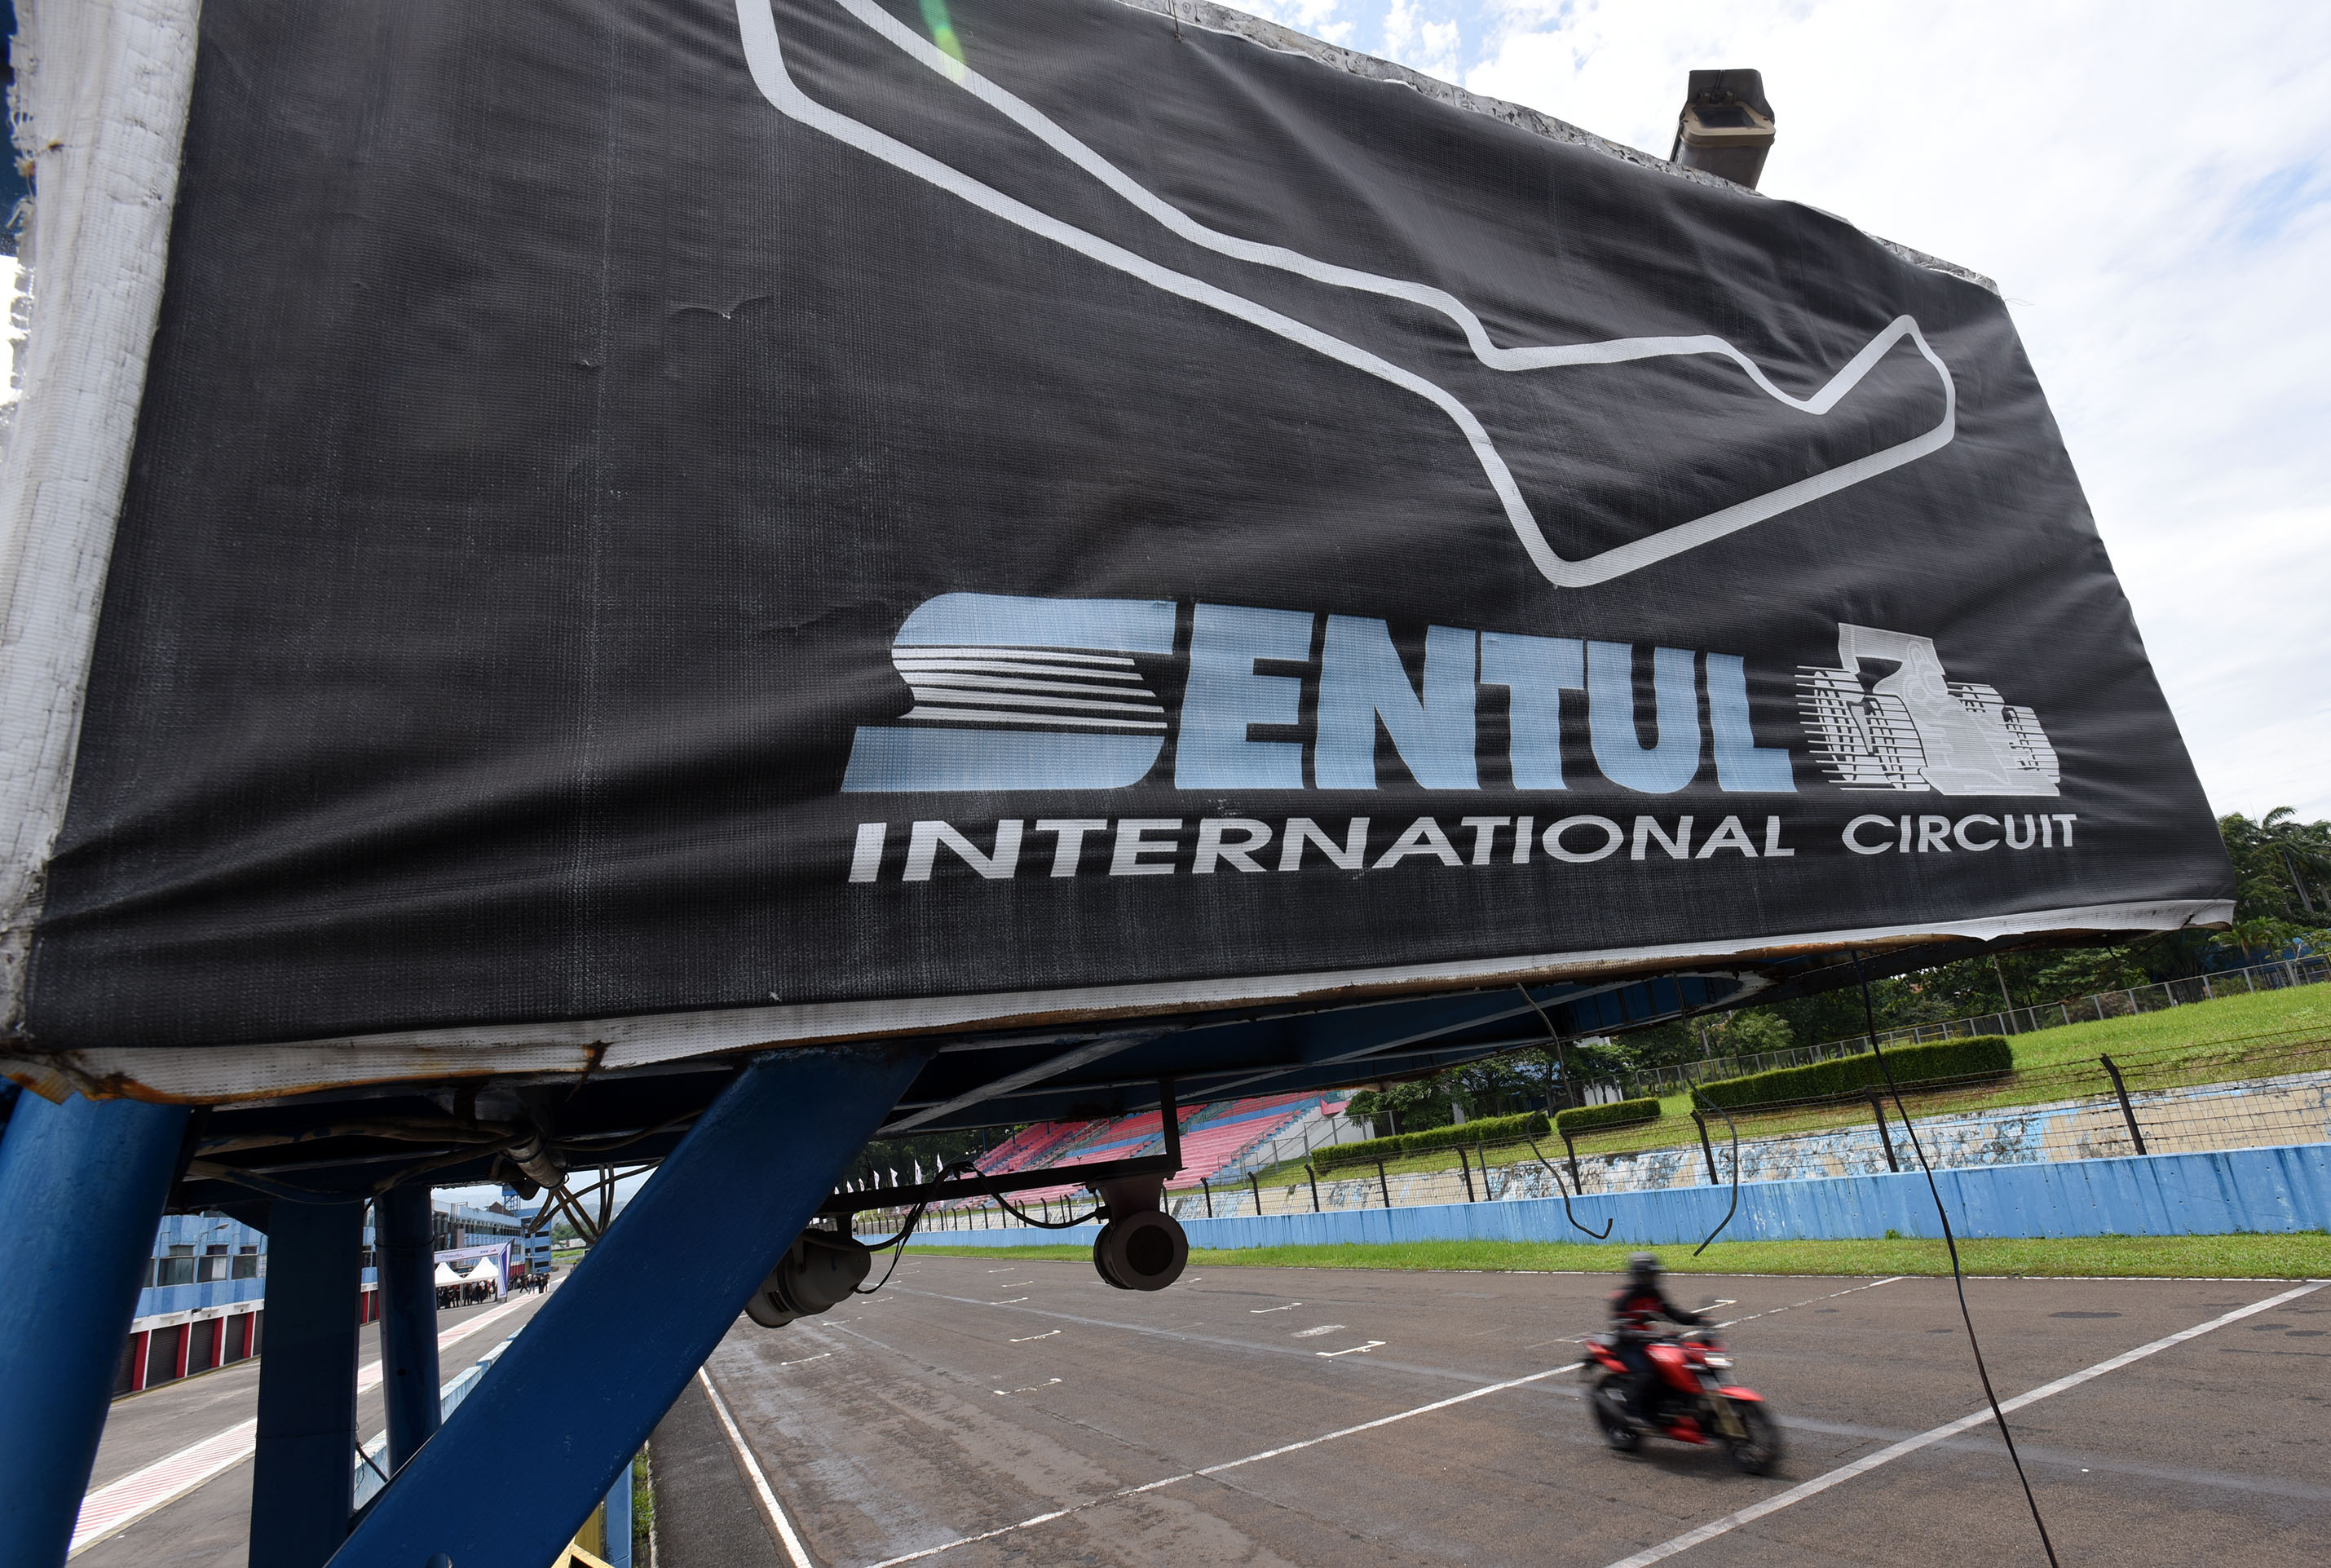 Circuit Sentul : Demi motogp indonesia sentul rela rombak sirkuit tanpa apbn